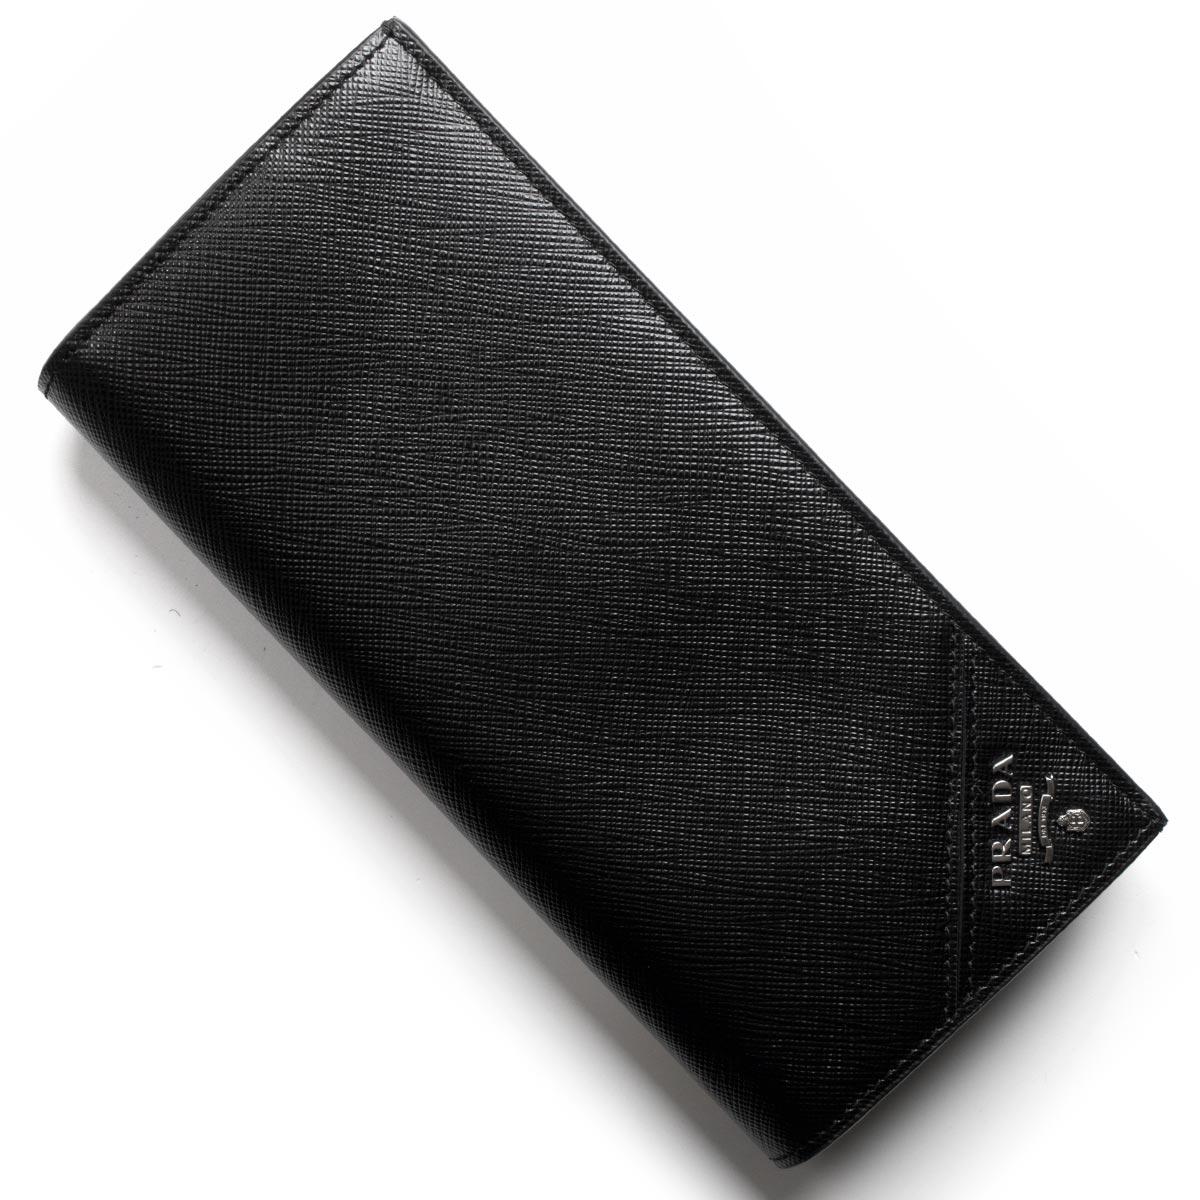 78a87a555de4 プラダ PRADA 長財布 サフィアーノ メタル/SAFFIANO METAL ブラック 2MV836 QME F0002 メンズ